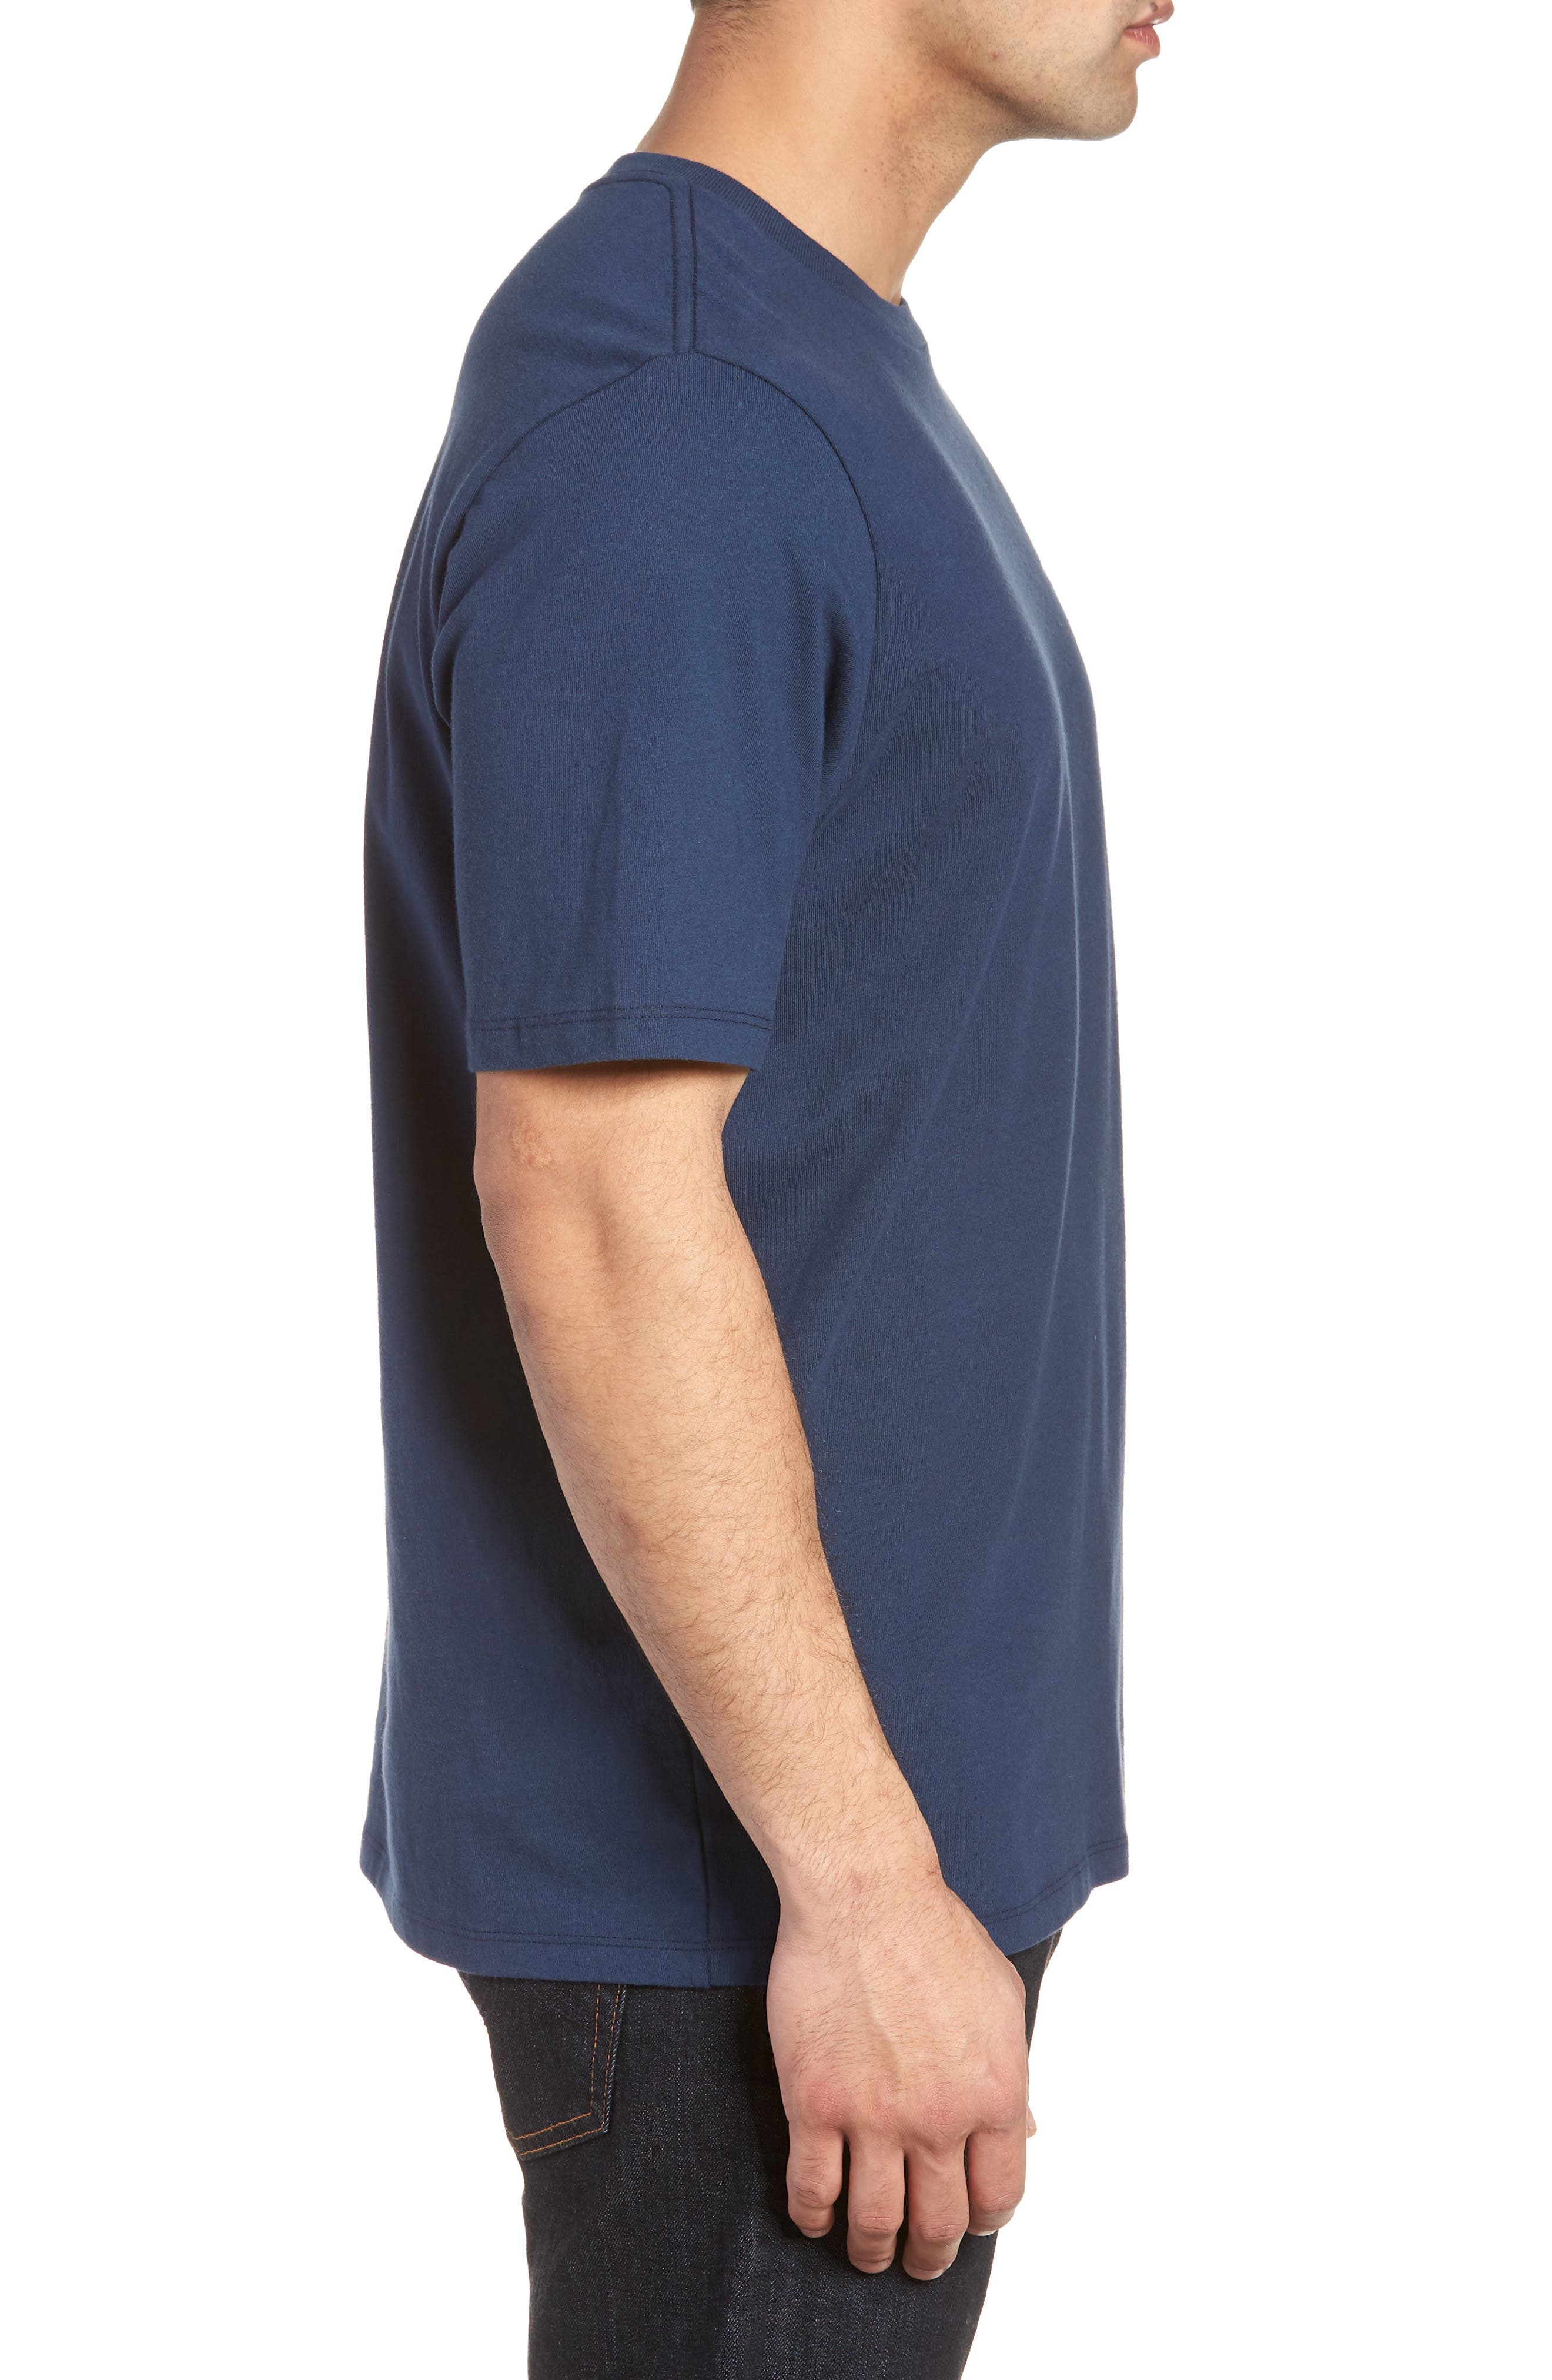 TOMMY BAHAMA,                             The Lawn Ranger T-Shirt,                             Alternate thumbnail 3, color,                             400